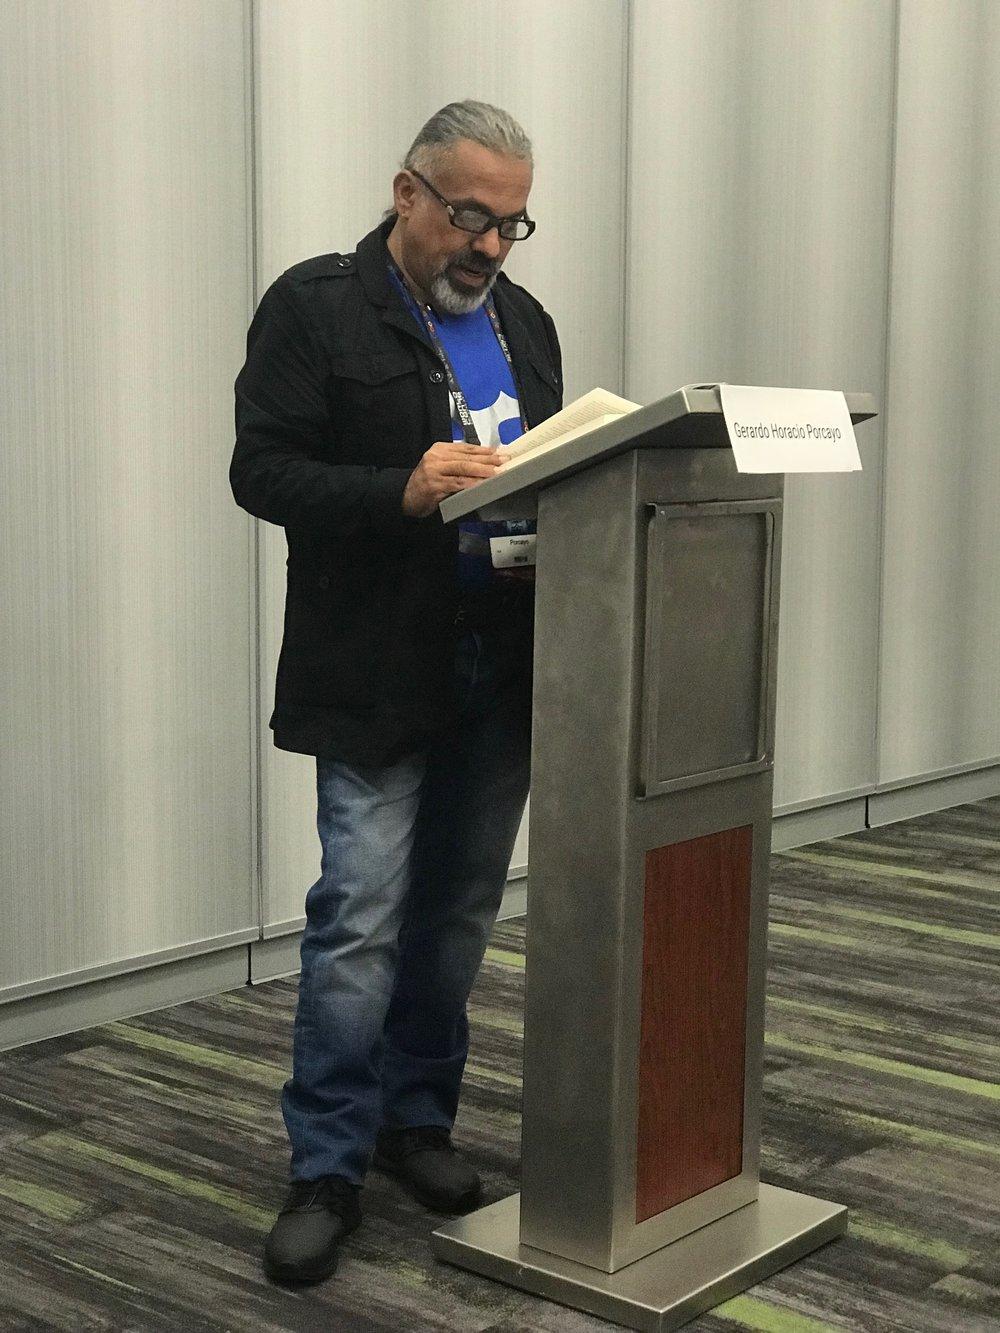 Gerardo Horacio Porcayo at the Mexicanx Initiative Spanish language group reading (Photo by Julia Rios)